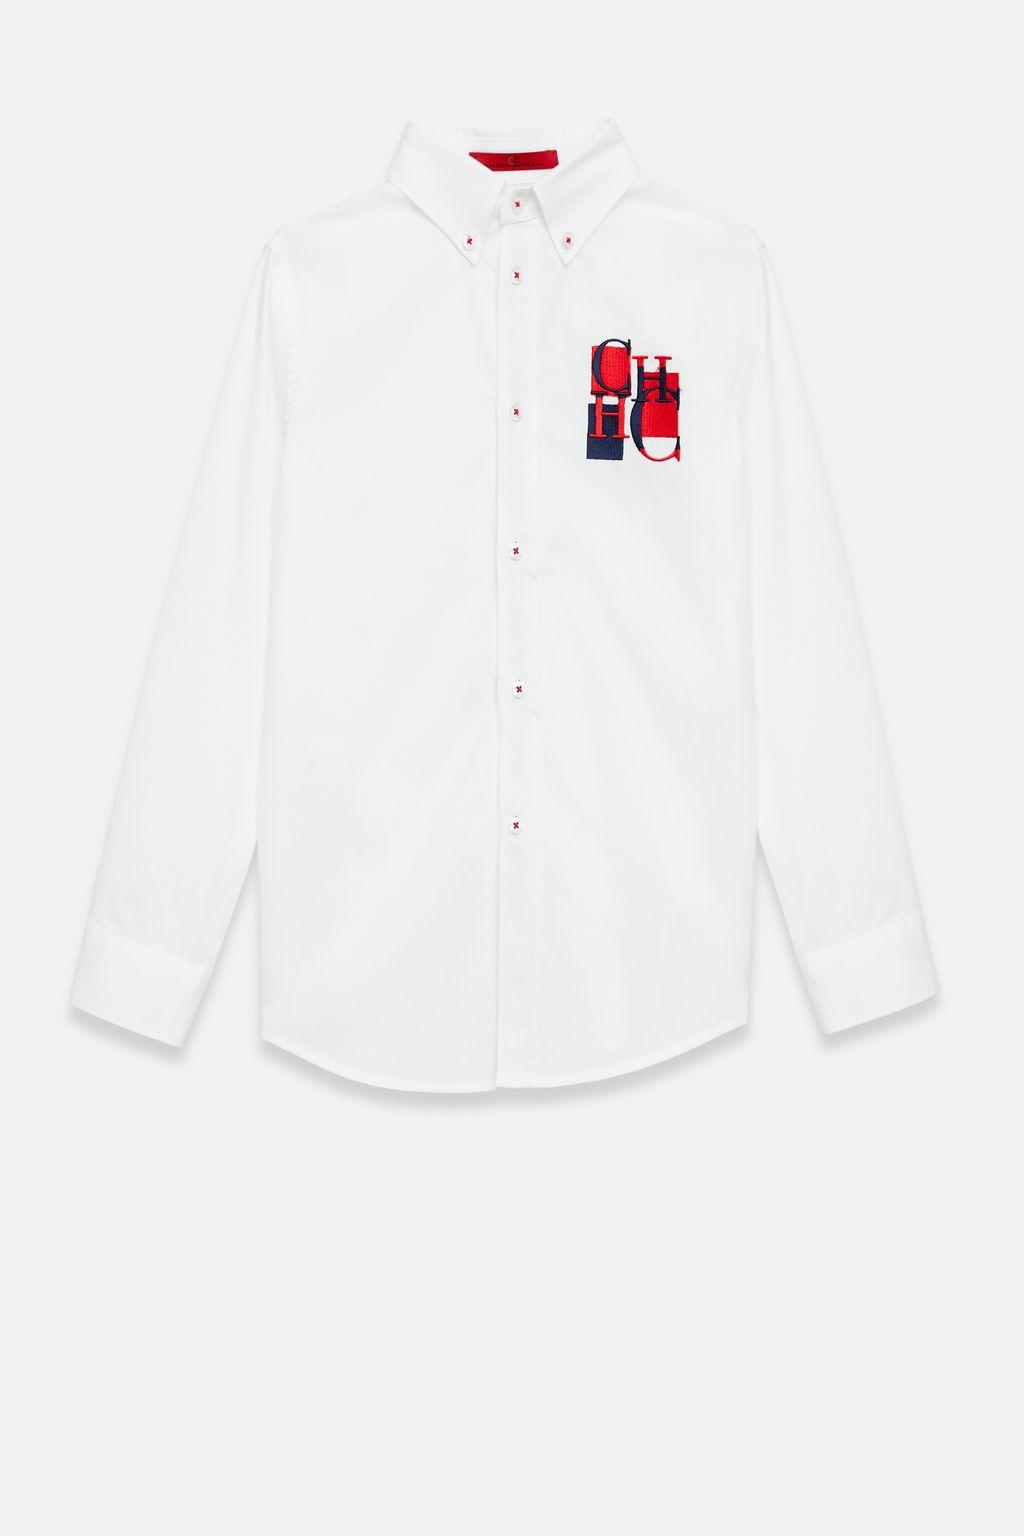 Two-tone Oxford shirt